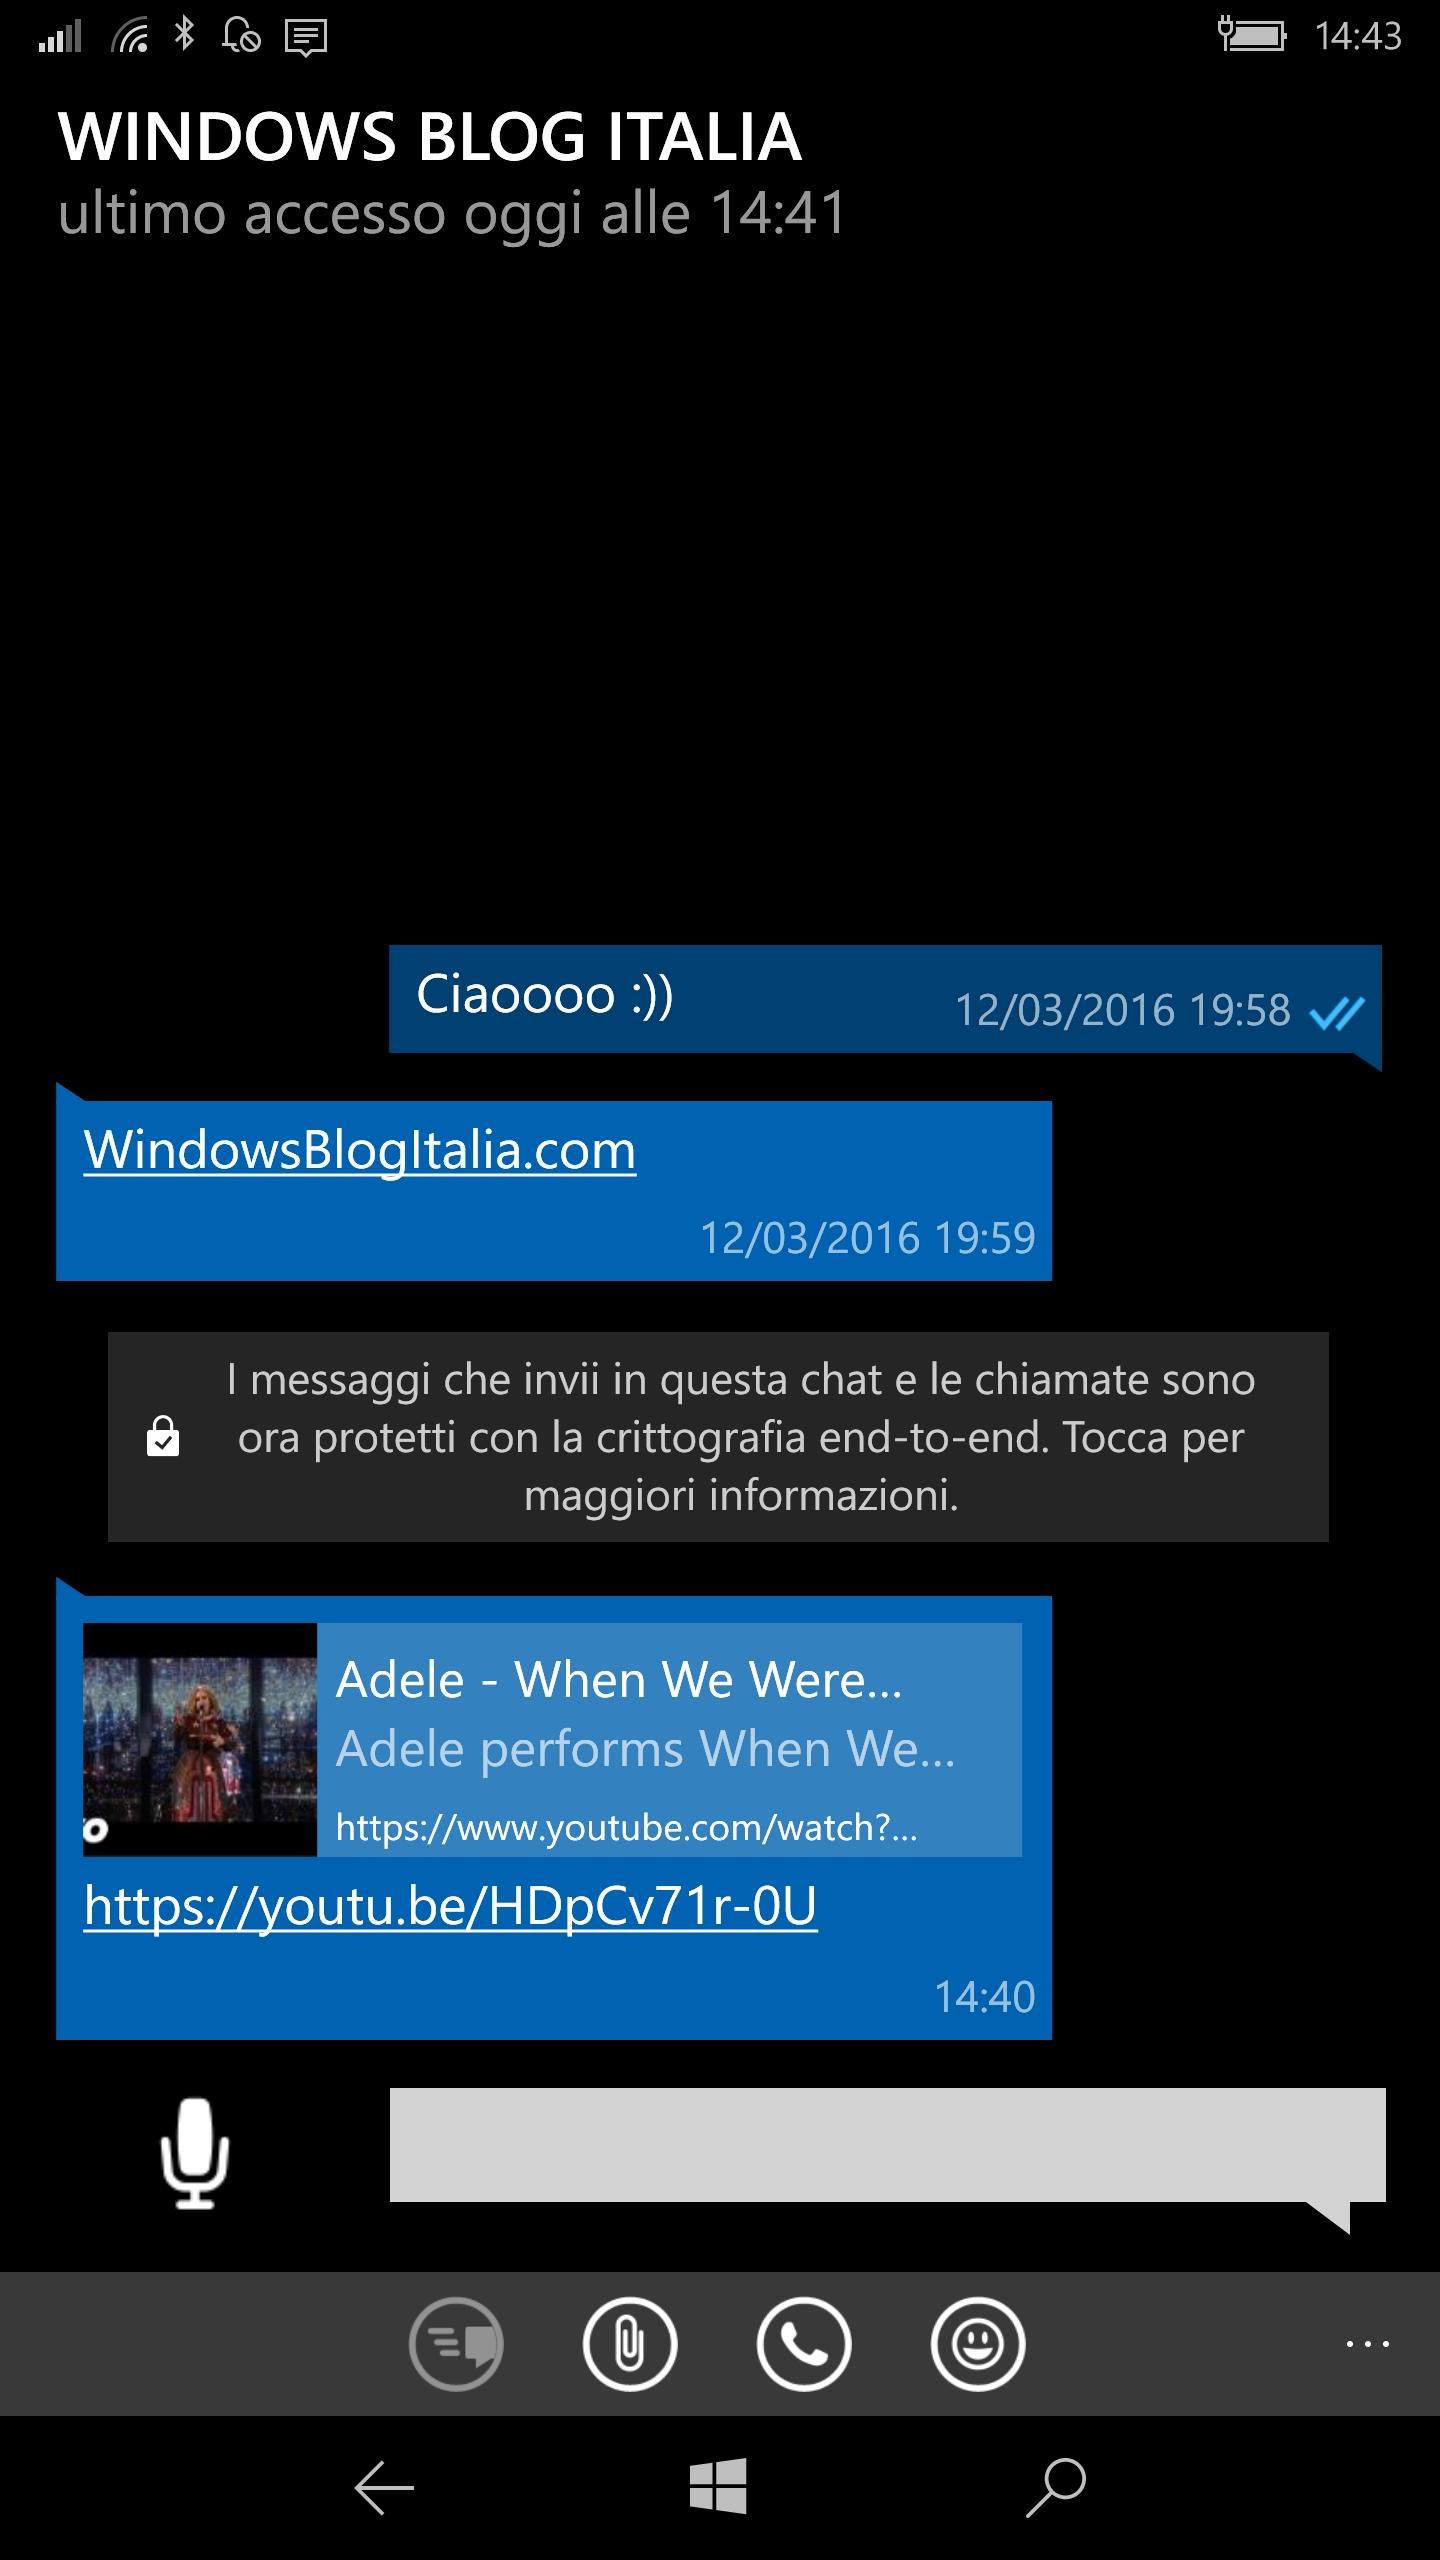 WhatsApp Beta - Anteprima link